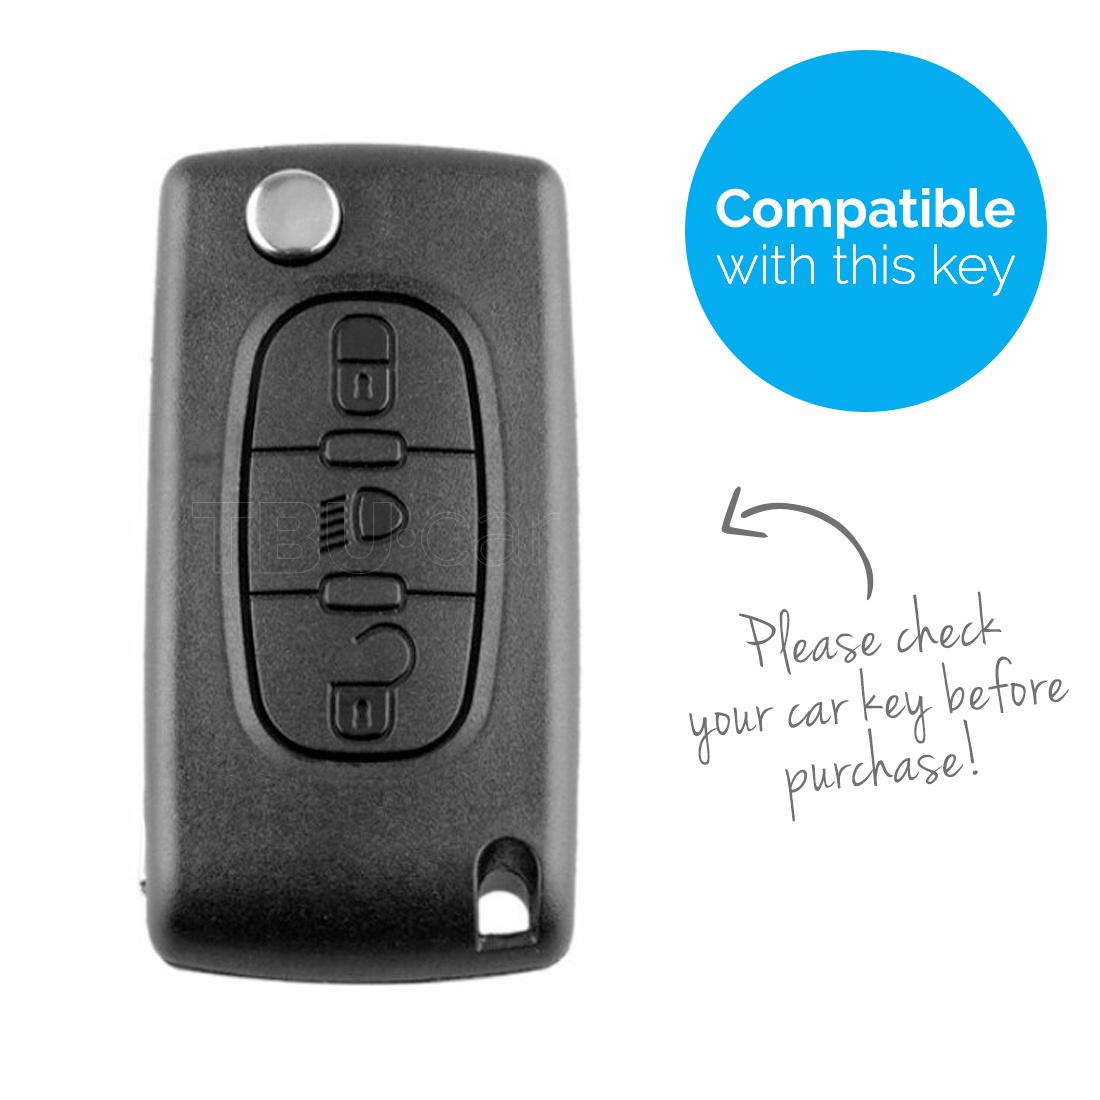 TBU car TBU car Sleutel cover compatibel met Citroën - Silicone sleutelhoesje - beschermhoesje autosleutel - Lichtblauw